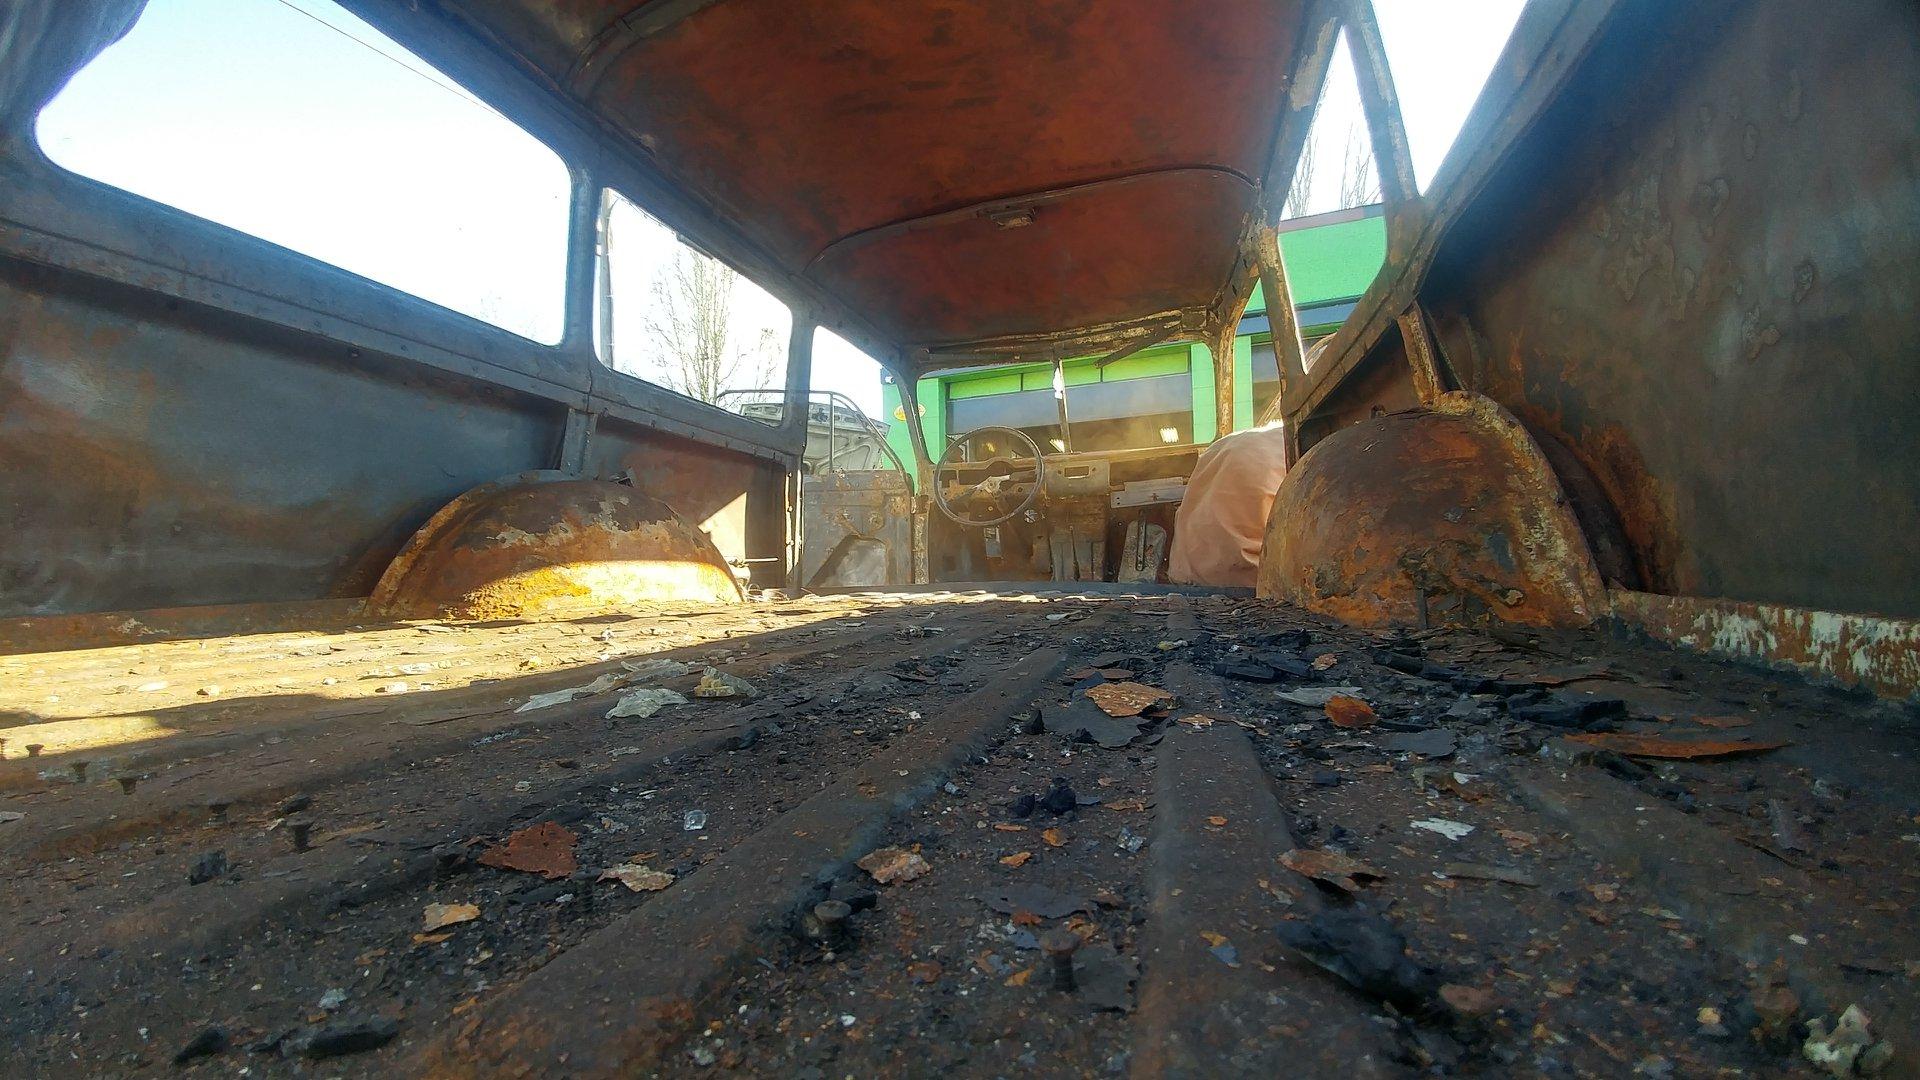 kirby family paradise volvo interior rust burn detail